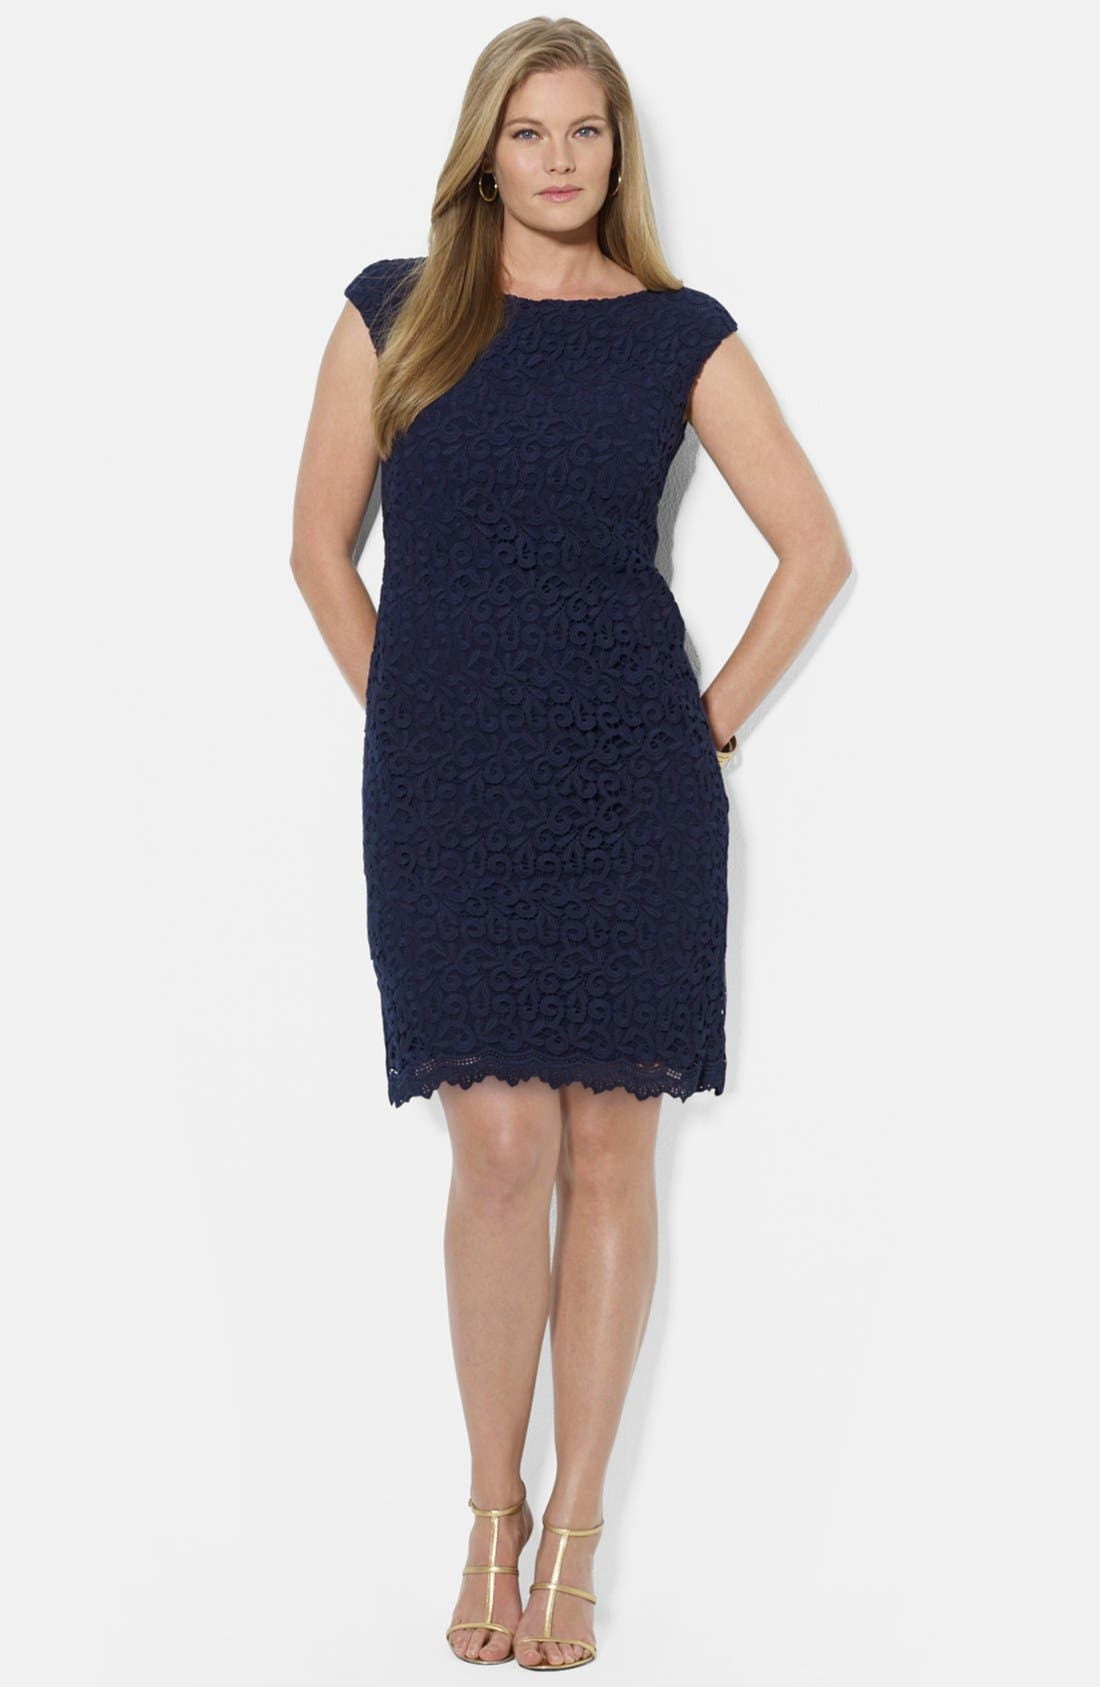 Alternate Image 1 Selected - Lauren Ralph Lauren Boatneck Lace Sheath Dress (Plus Size)